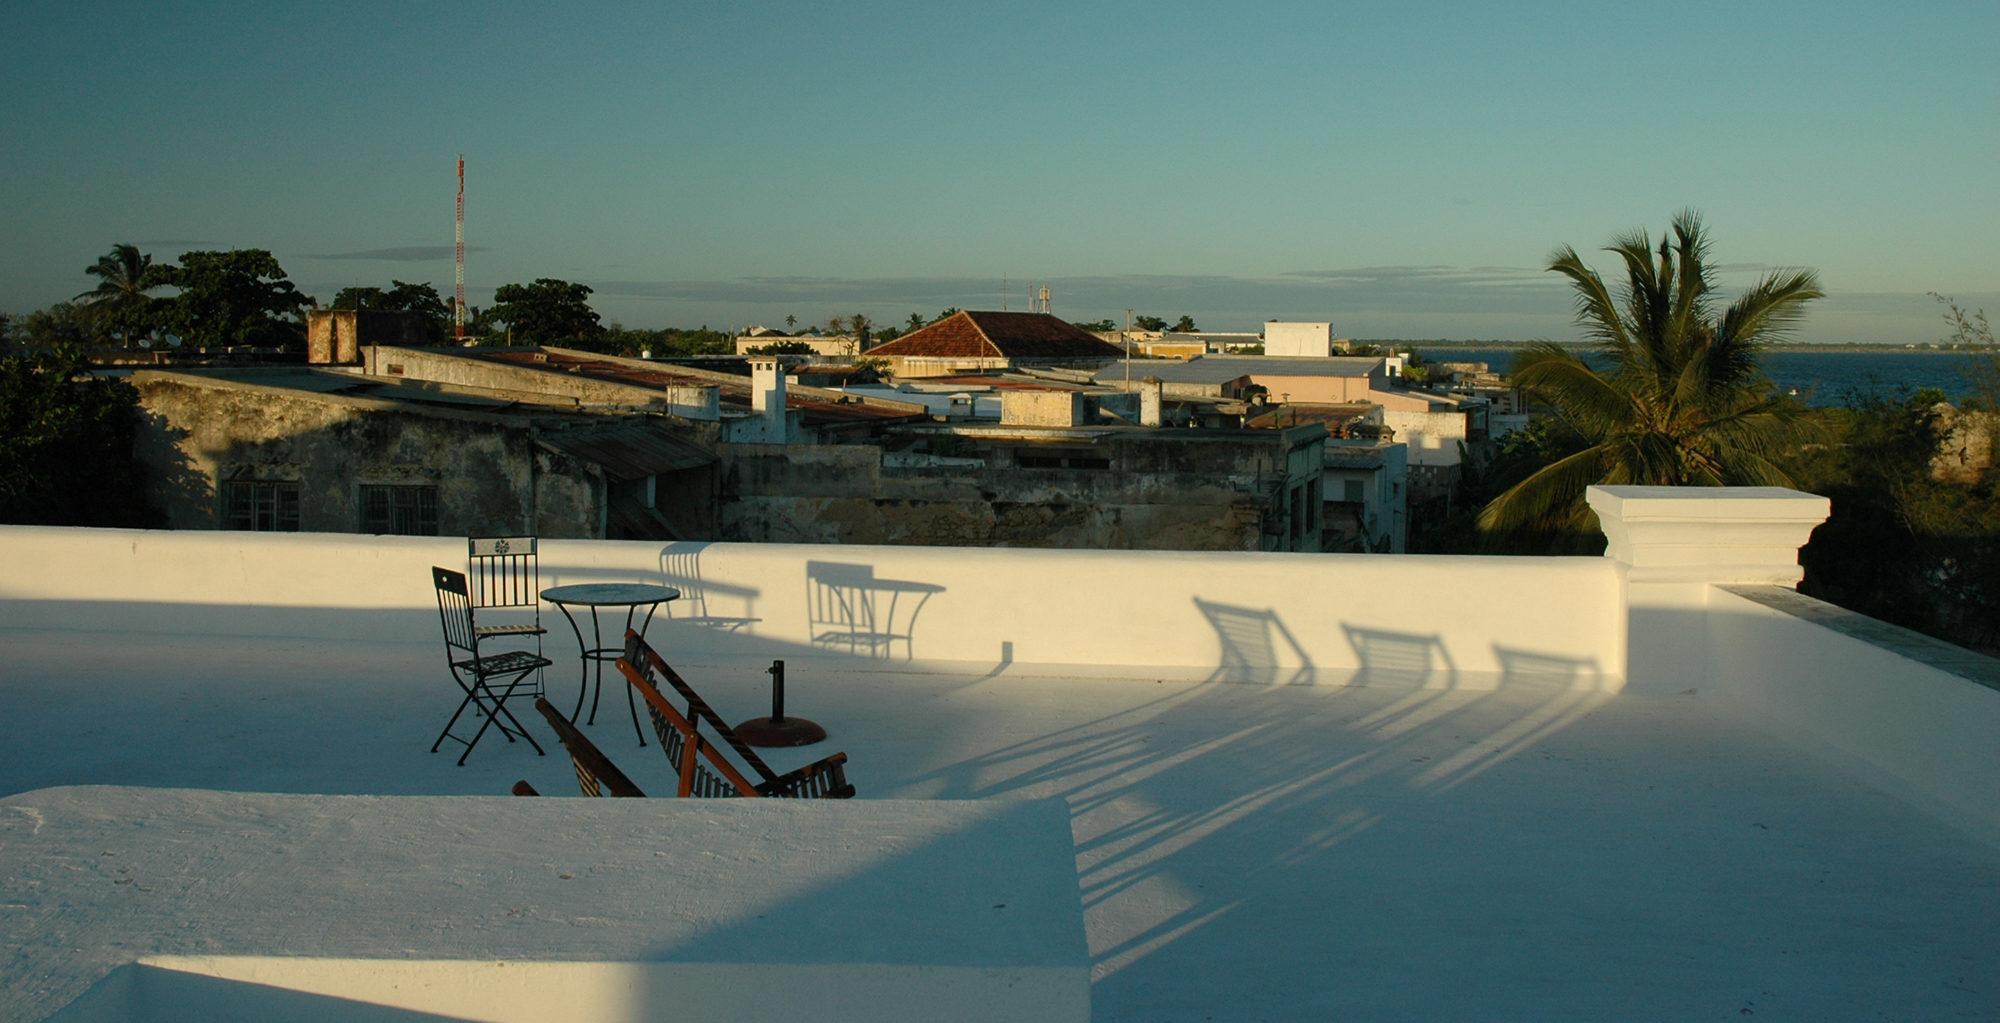 Mozambique-Terraco-Das-Quitandas-View-From-Roof